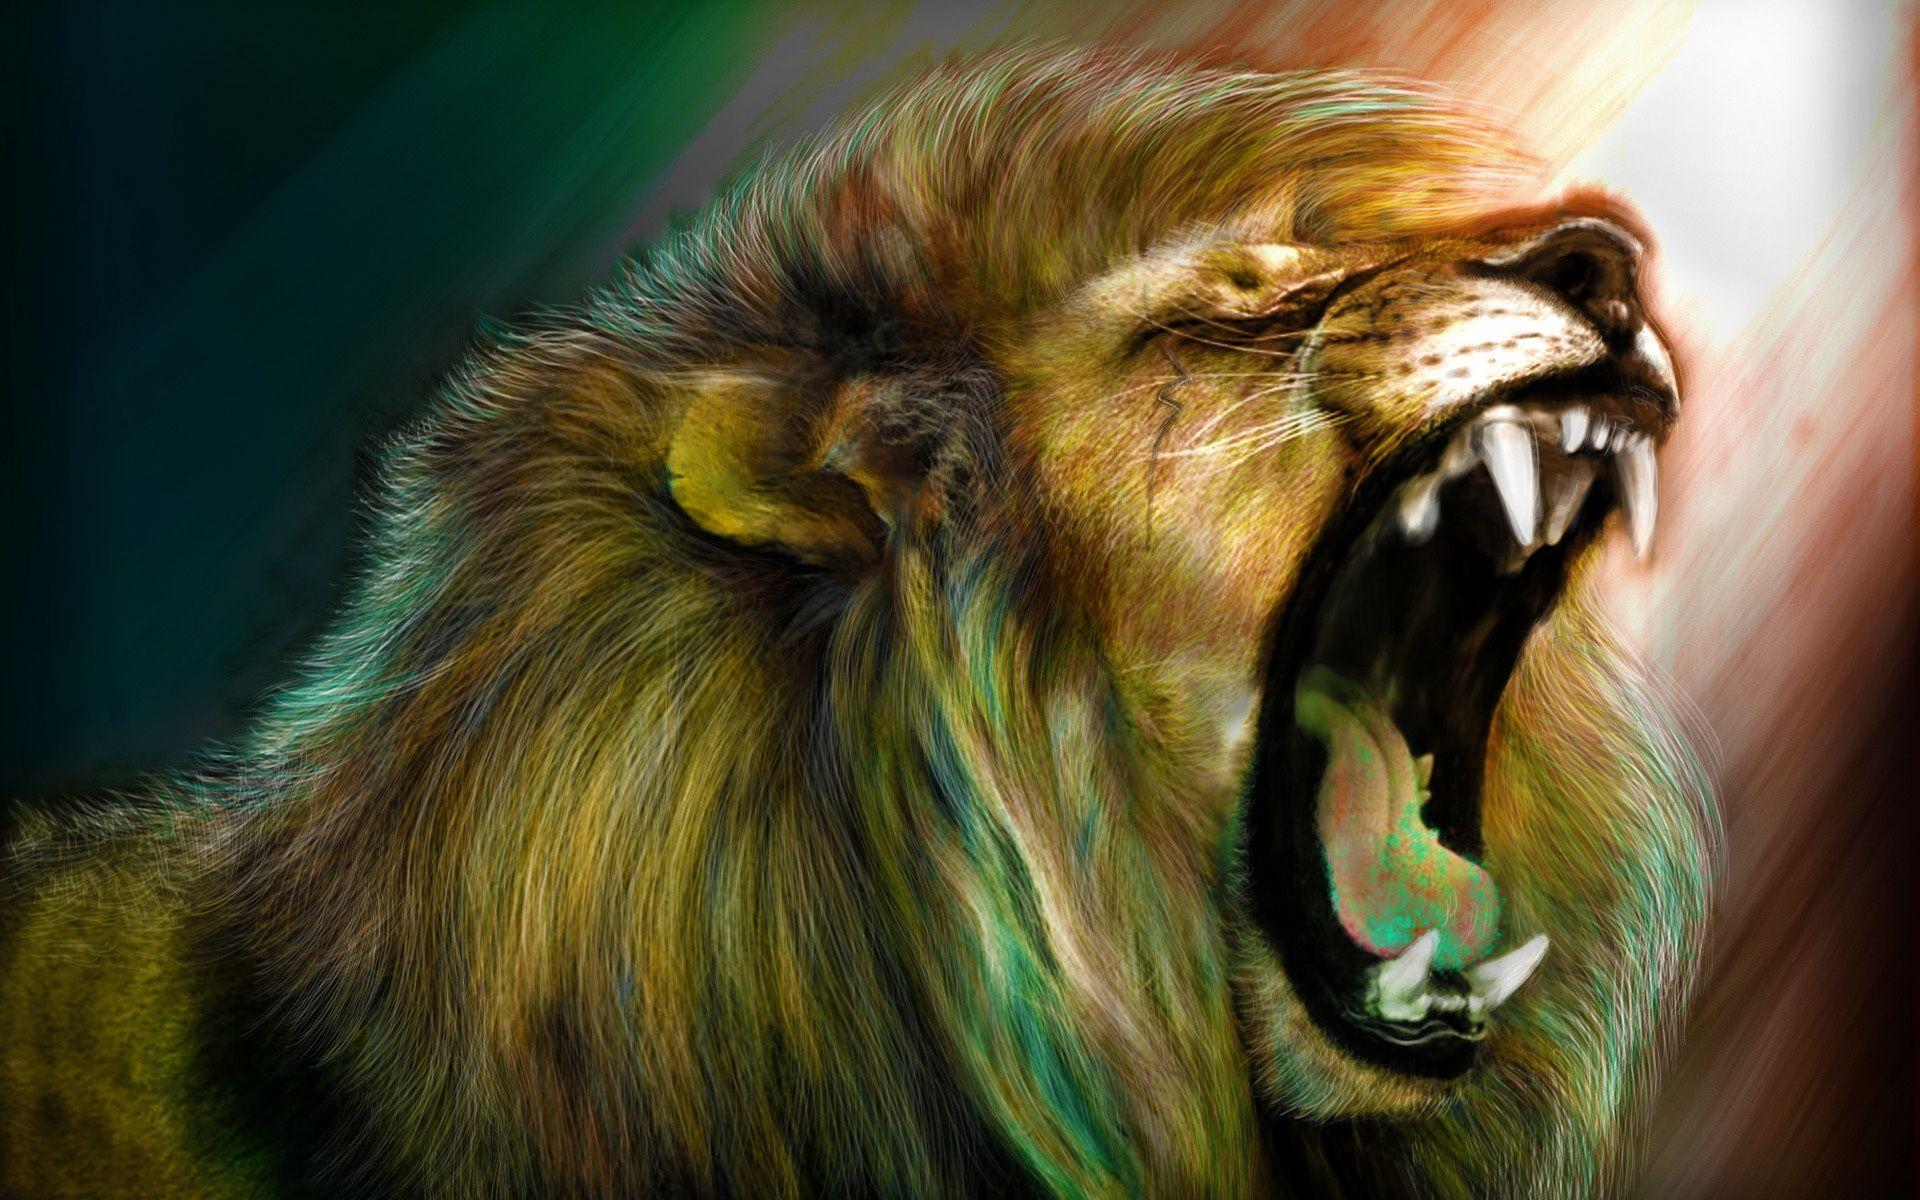 Download The Lions Roar Wallpaper